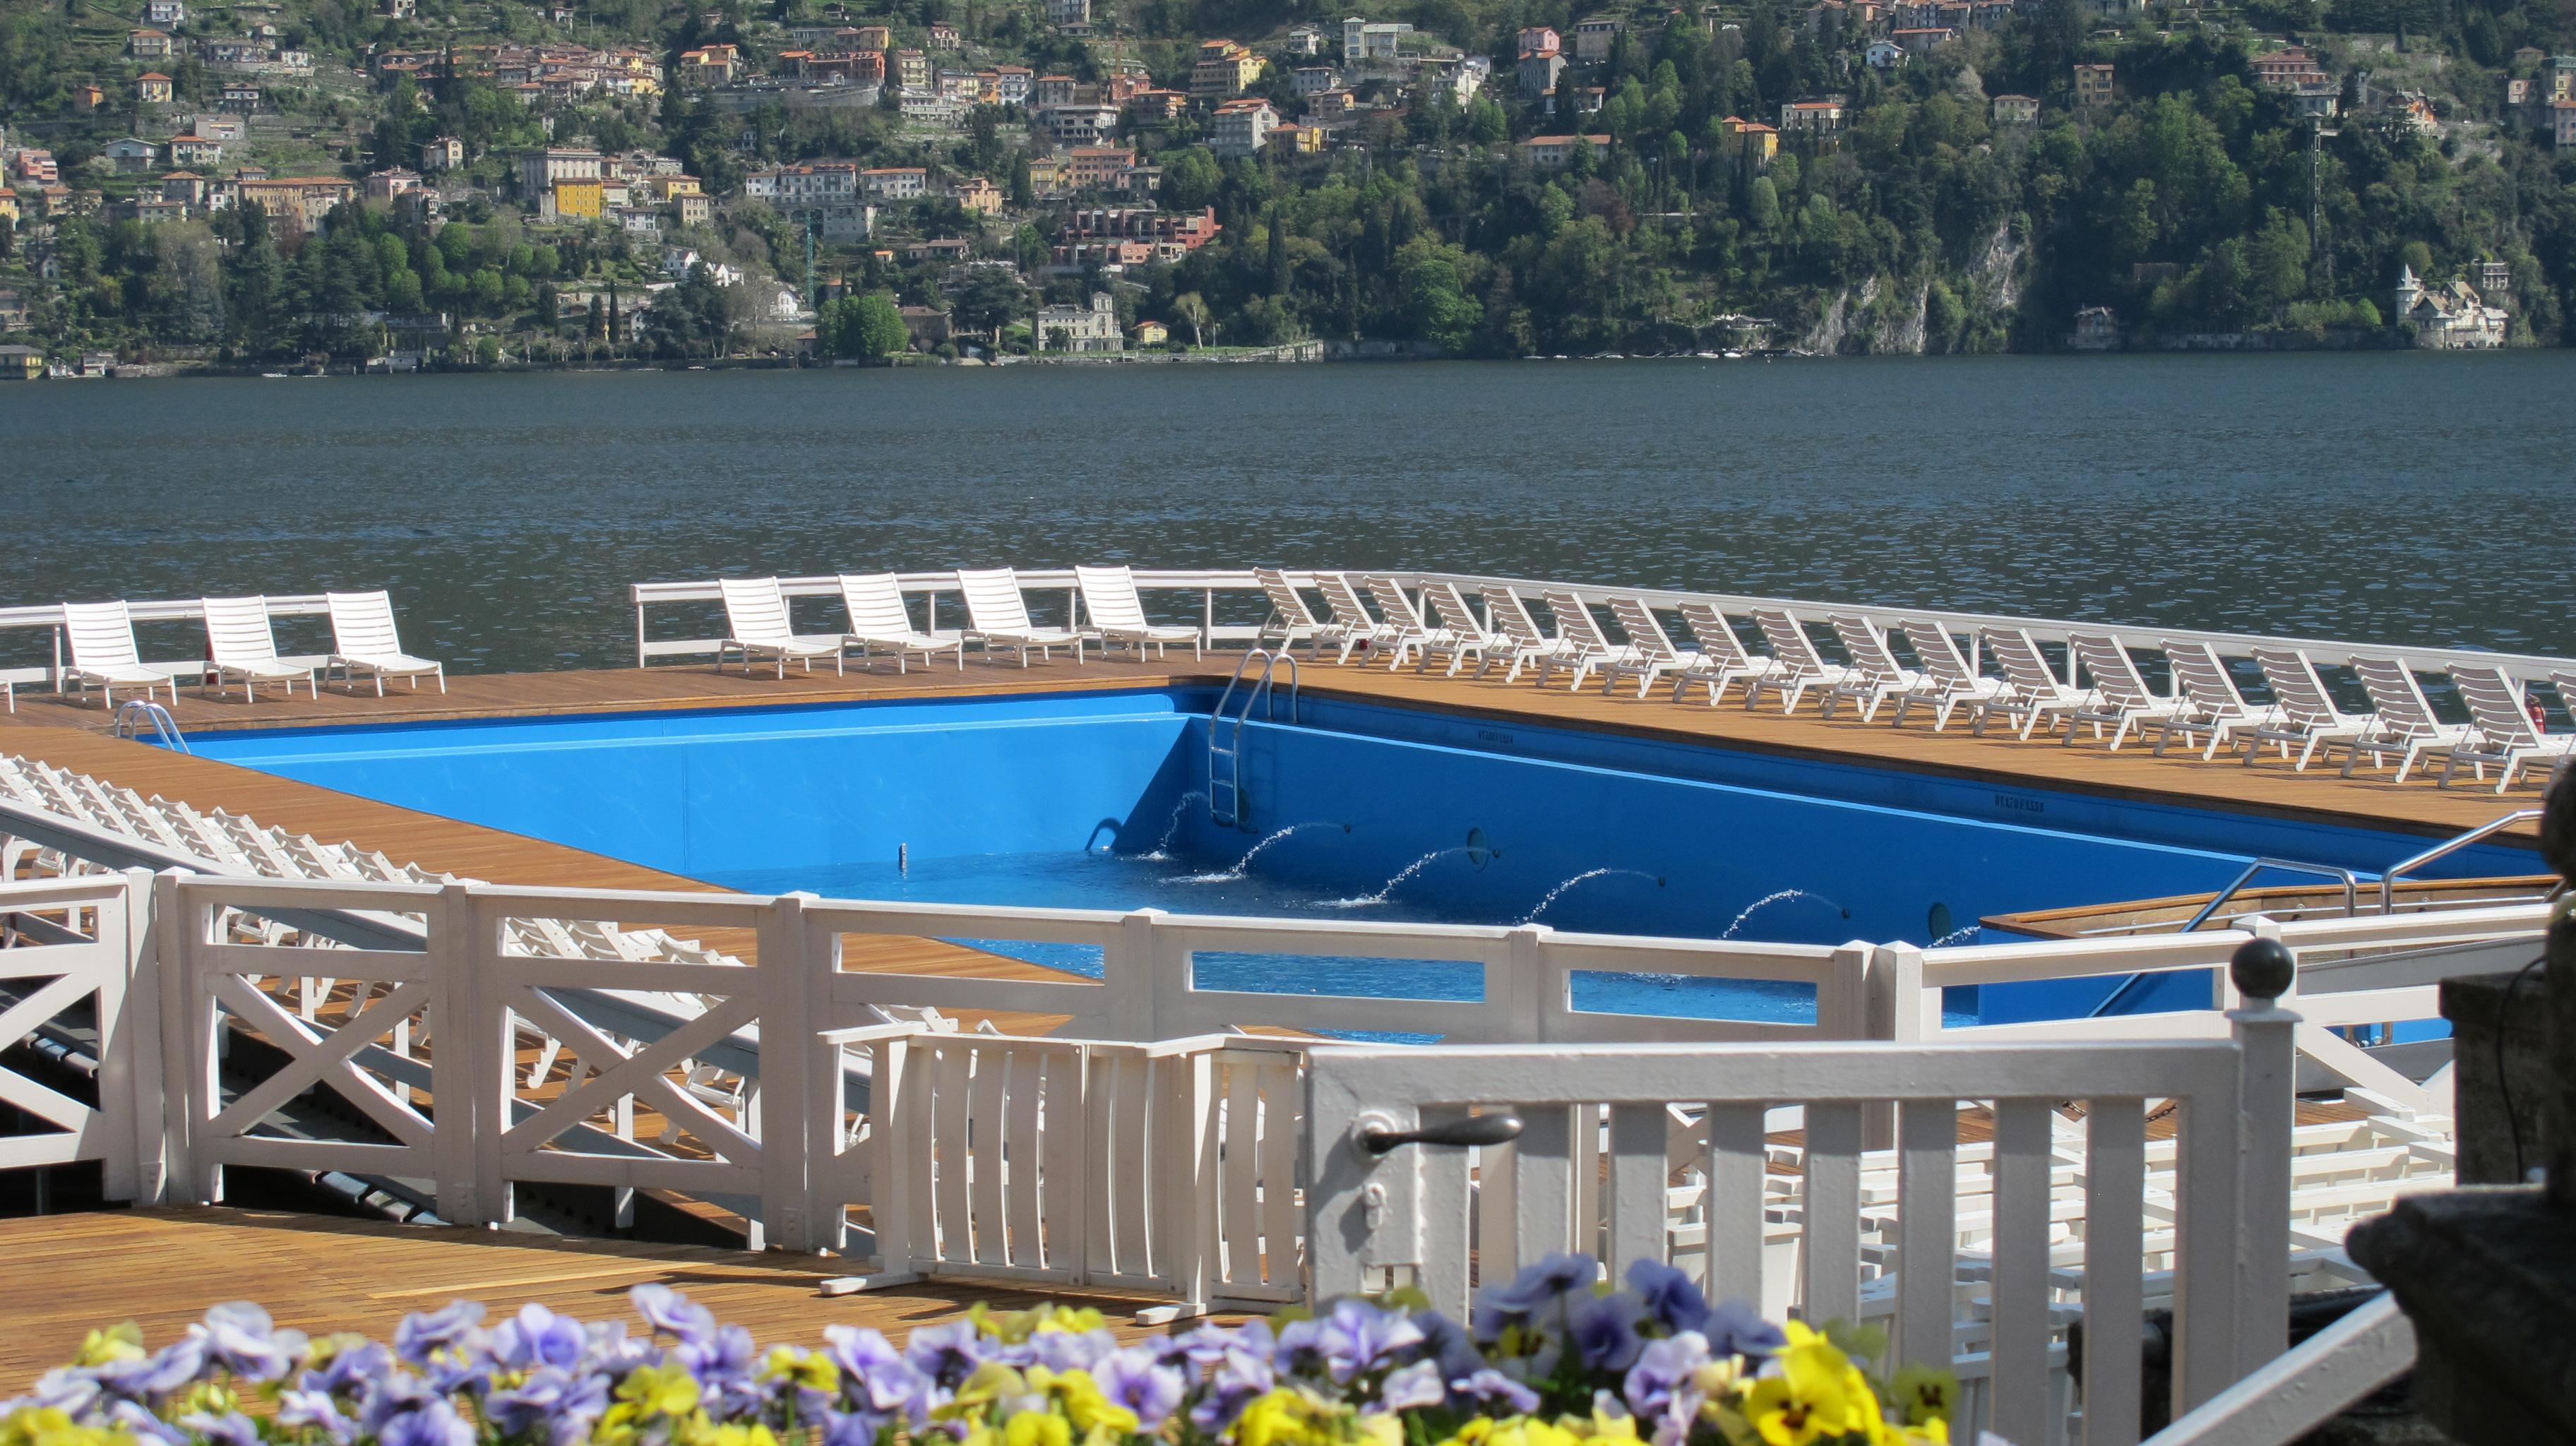 Villa d este lake como bagni di lucca and beyond for Villa d este como ristorante